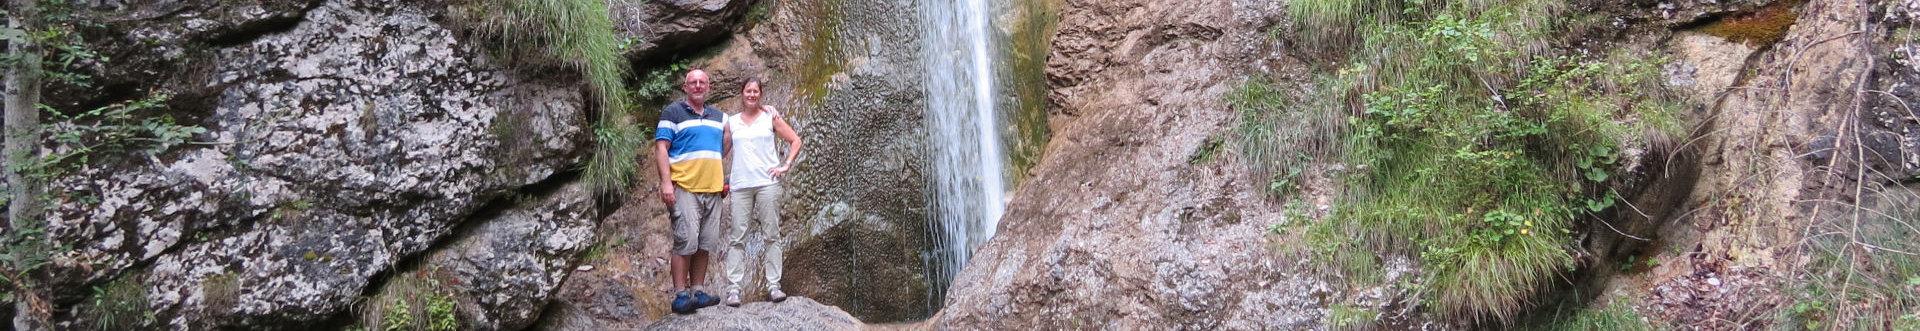 15waterfall